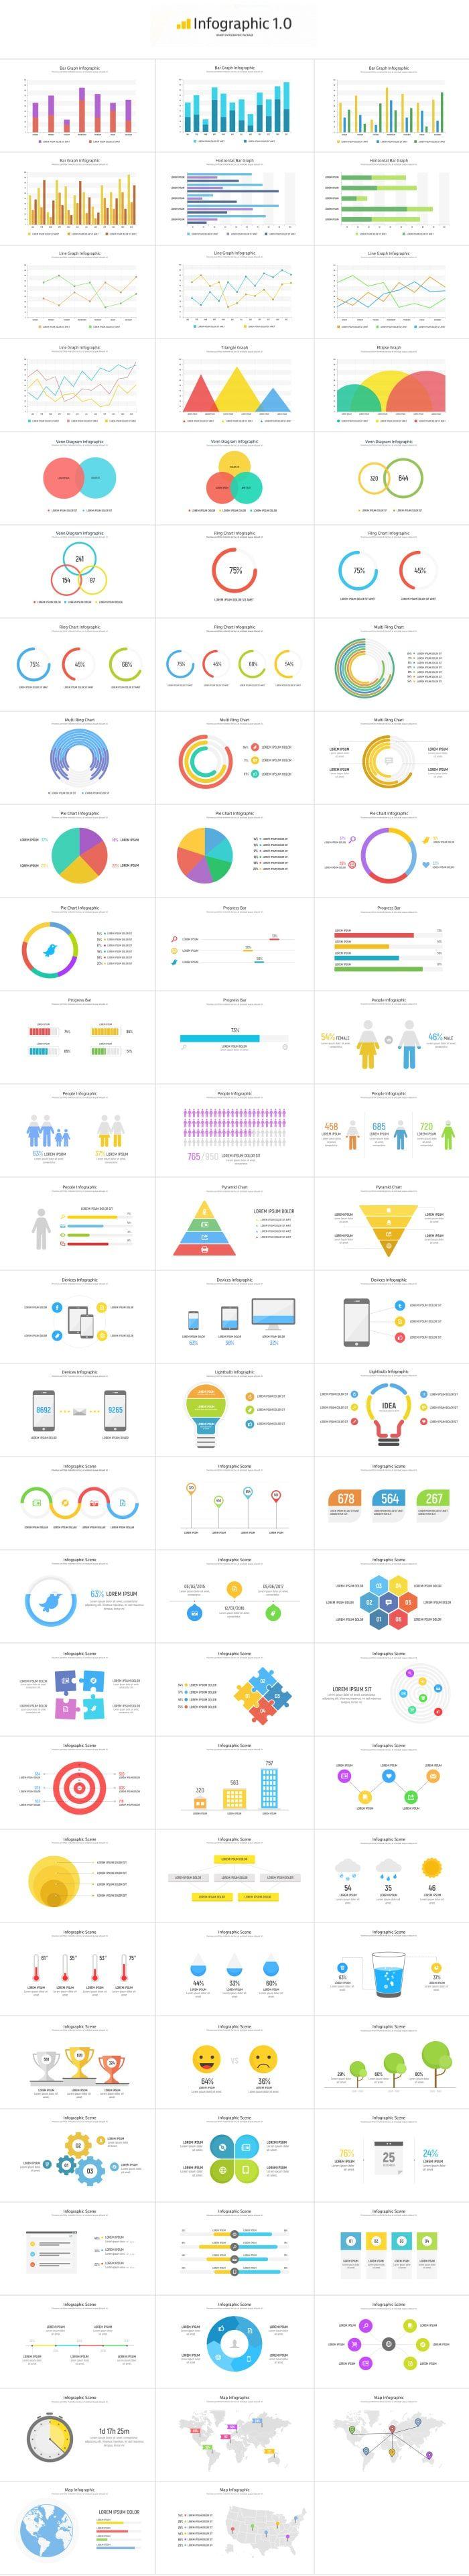 más de 25 ideas increíbles sobre free after effects projects en, Powerpoint templates